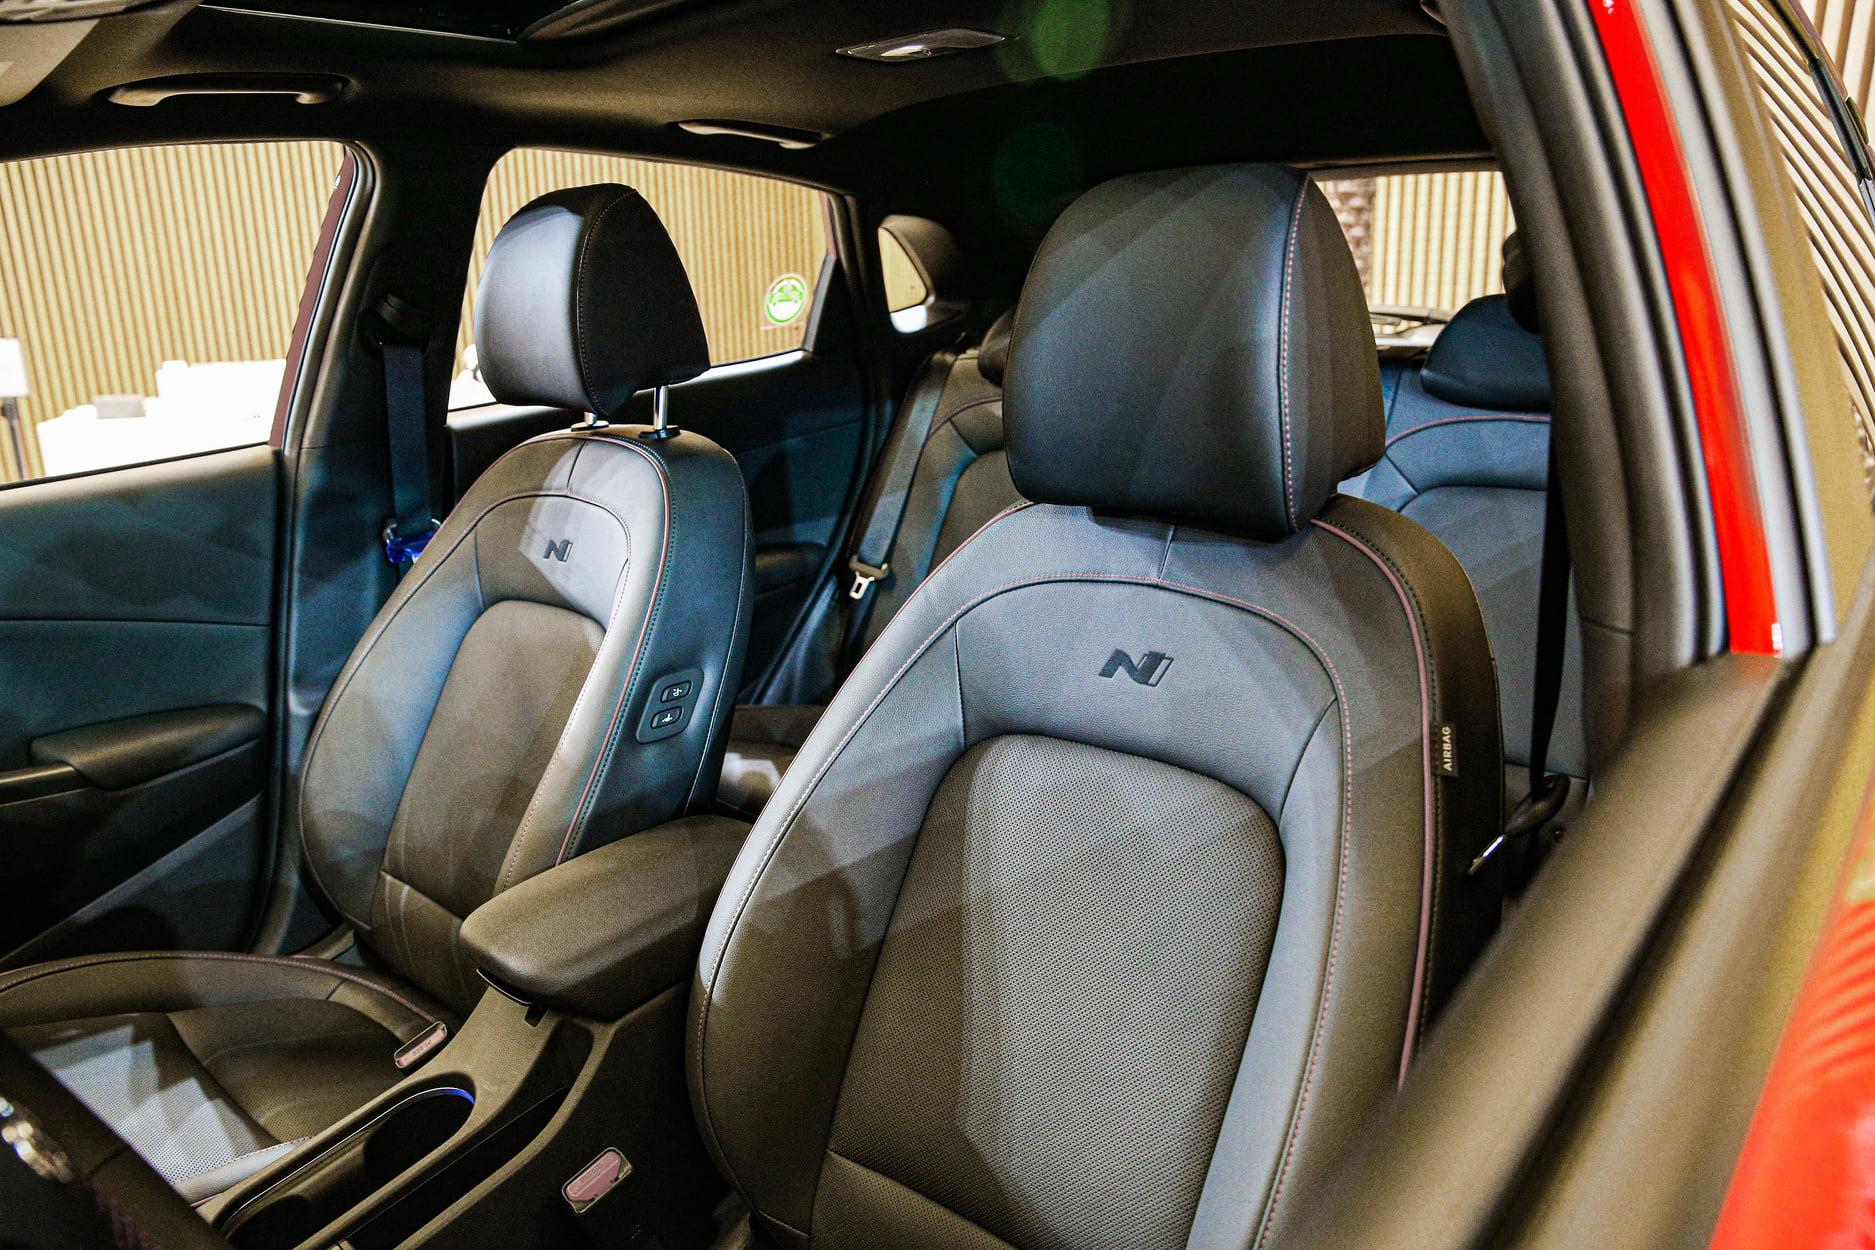 giá Hyundai Kona lăn bánh bao nhiêu